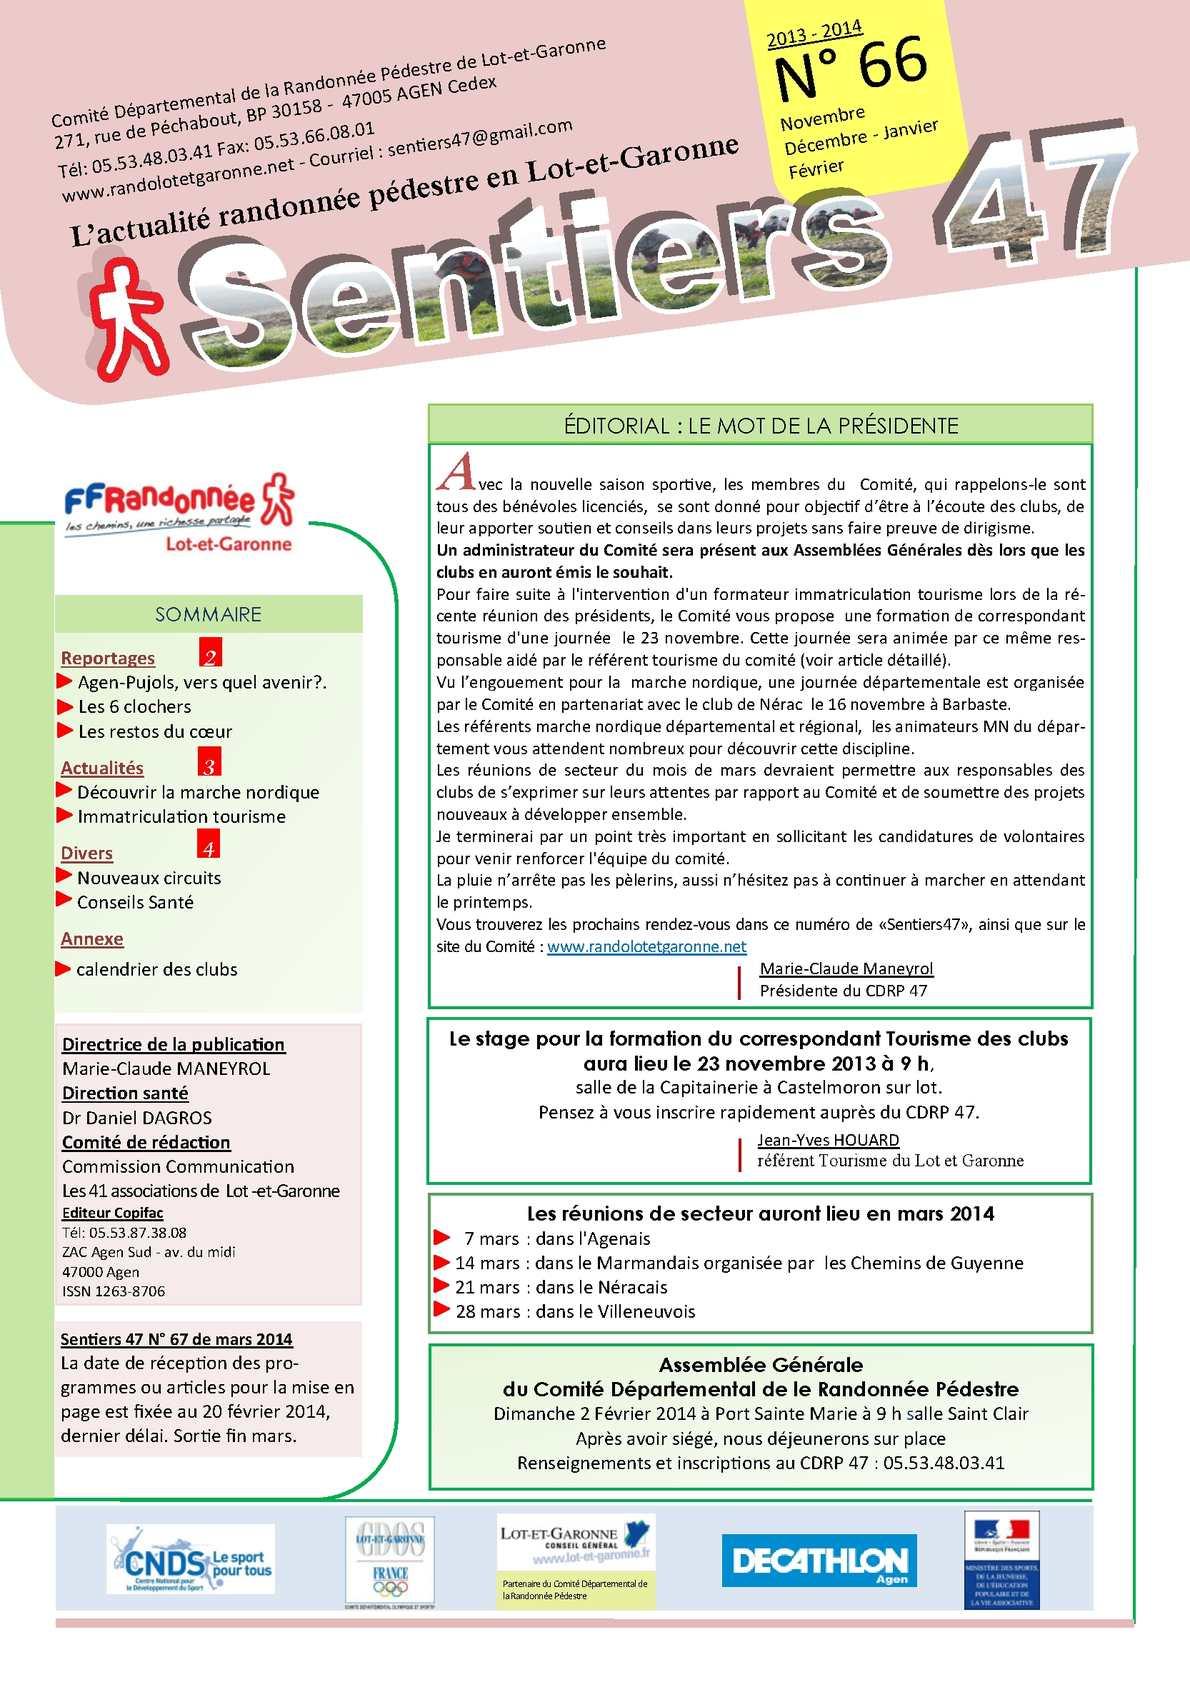 Calendrier Randonnee Pedestre Lot Et Garonne.Calameo Sentiers 47 N 66